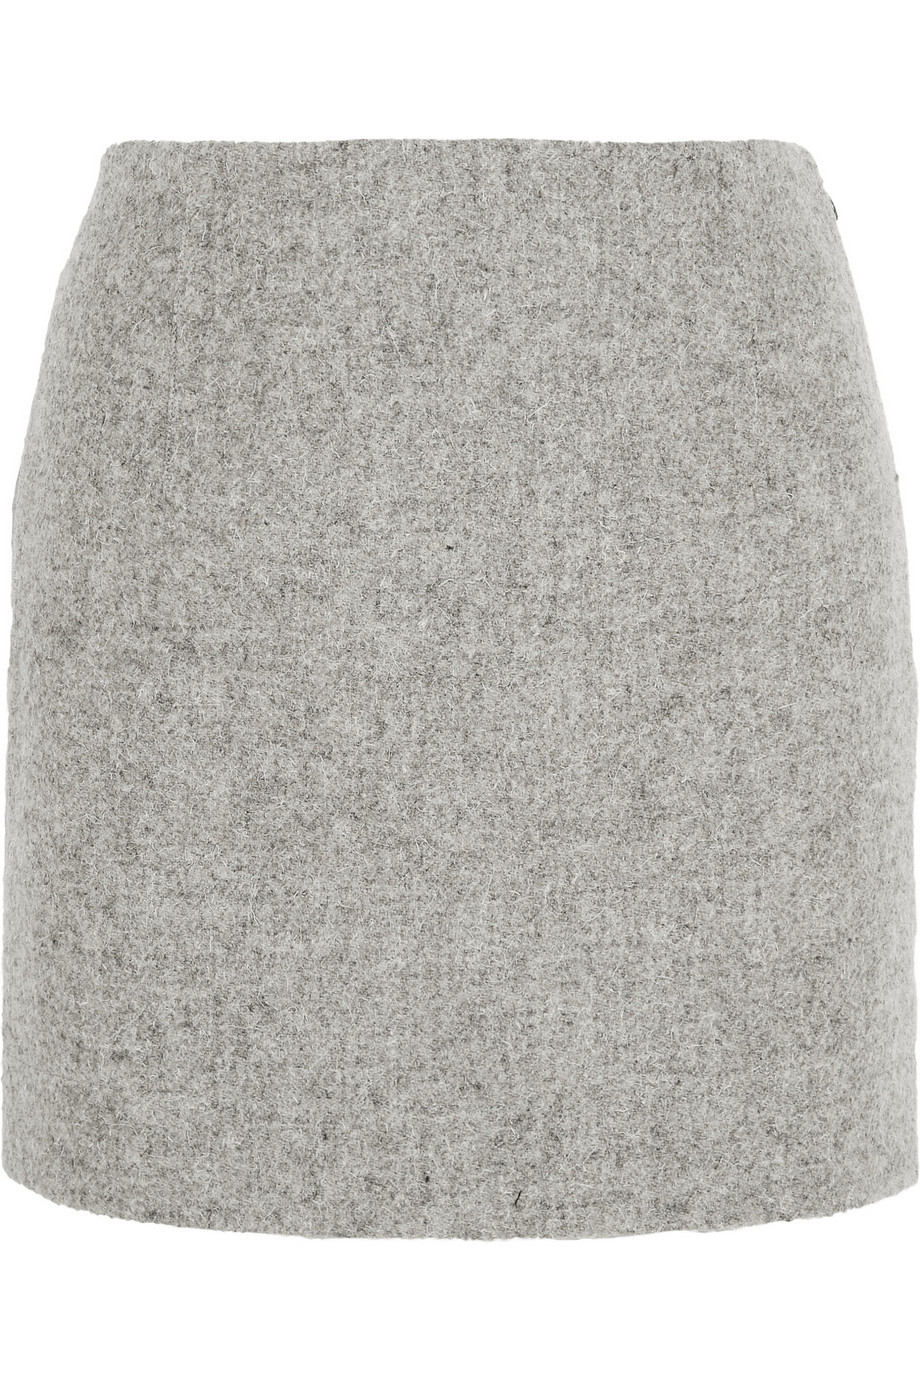 5732e94263 Atto Wool Mini Skirt in Gray - Lyst